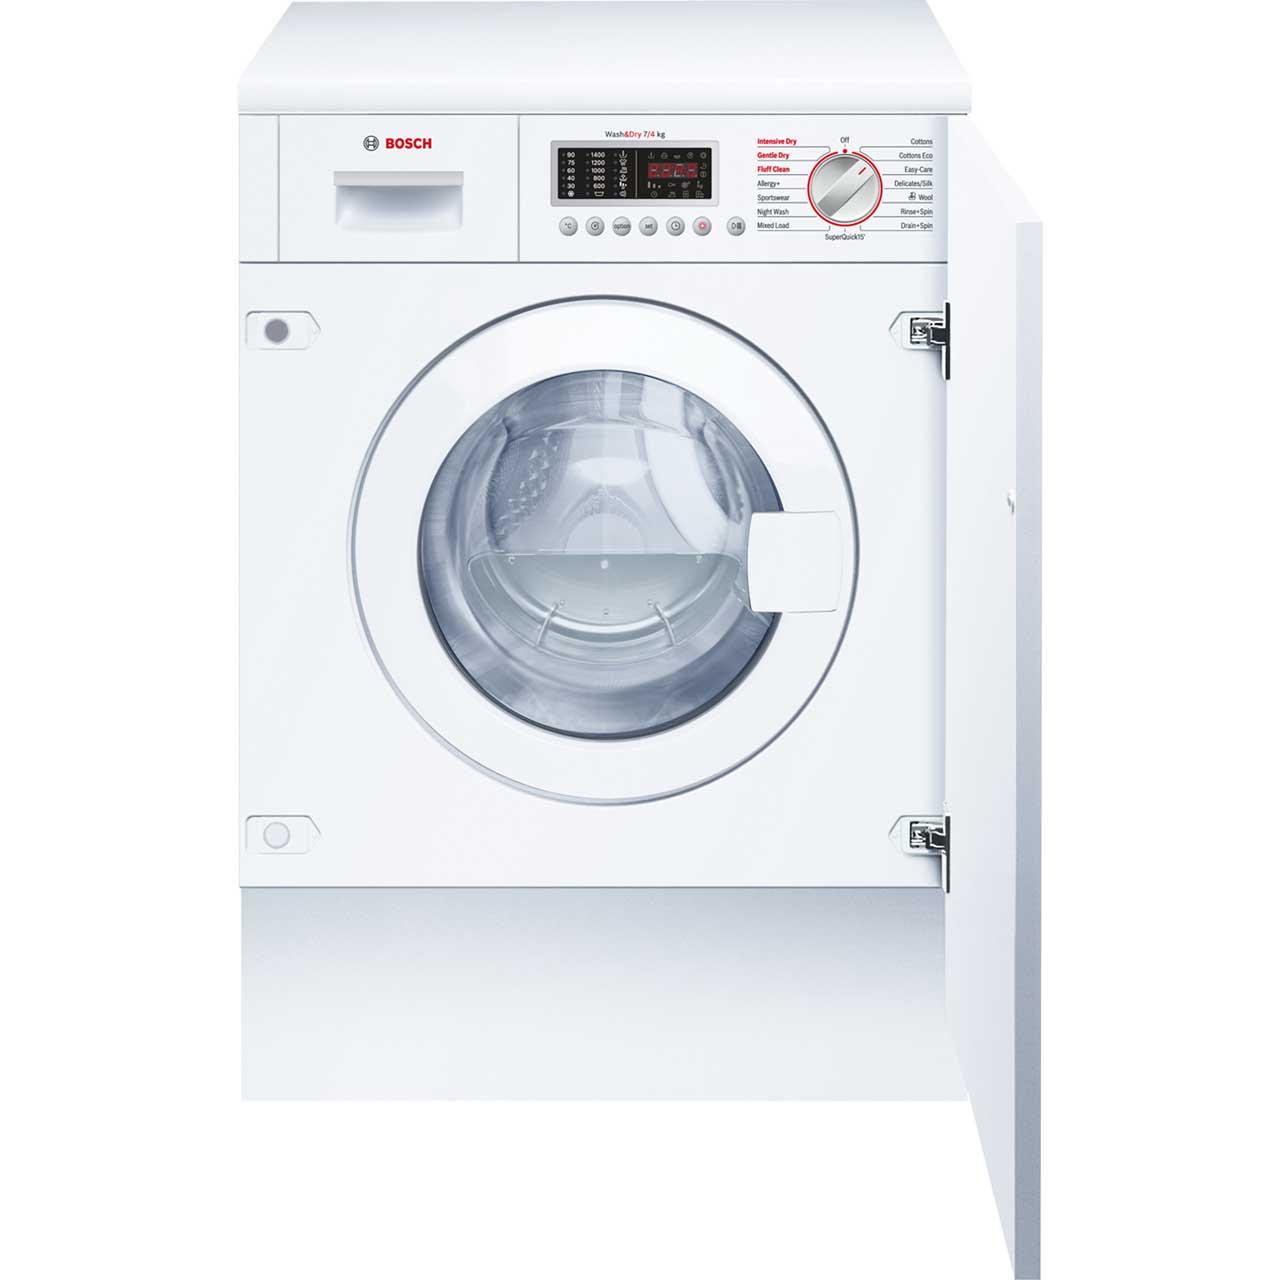 Bosch Serie 6 WKD28541GB Integrated Washer Dryer in White